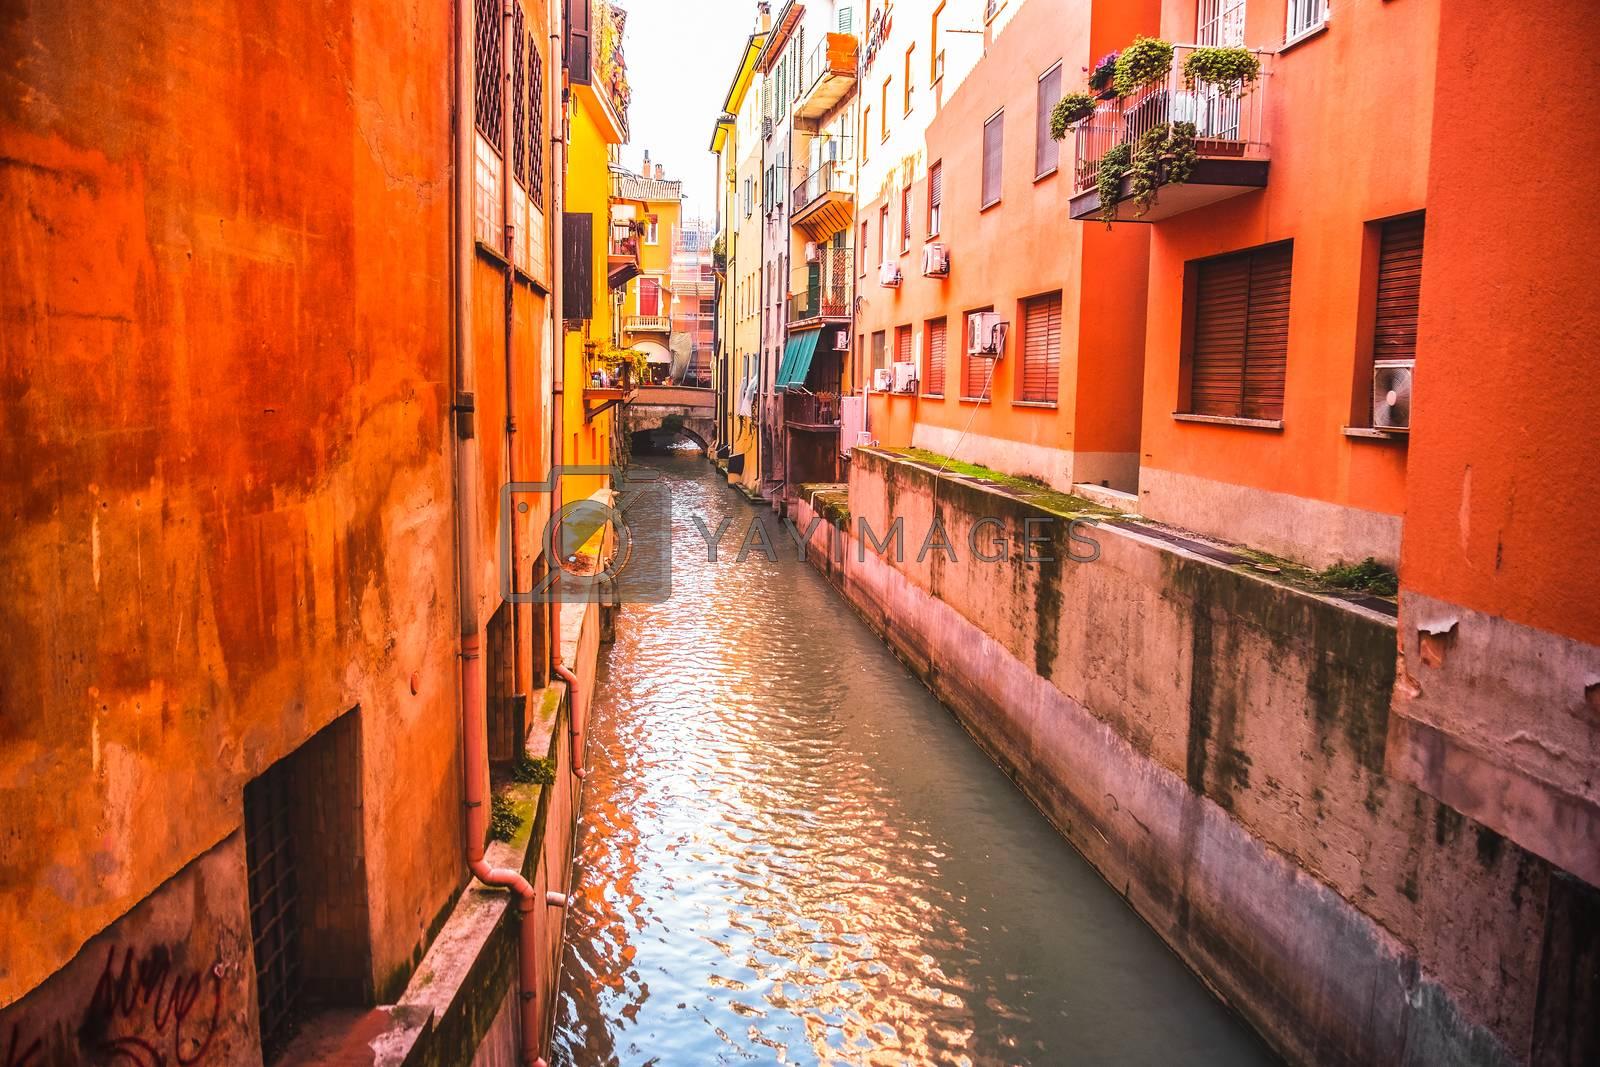 italian houses between the hidden canal of Reno river in Via Oberdan - Bologna - Emilia Romagna - Italy